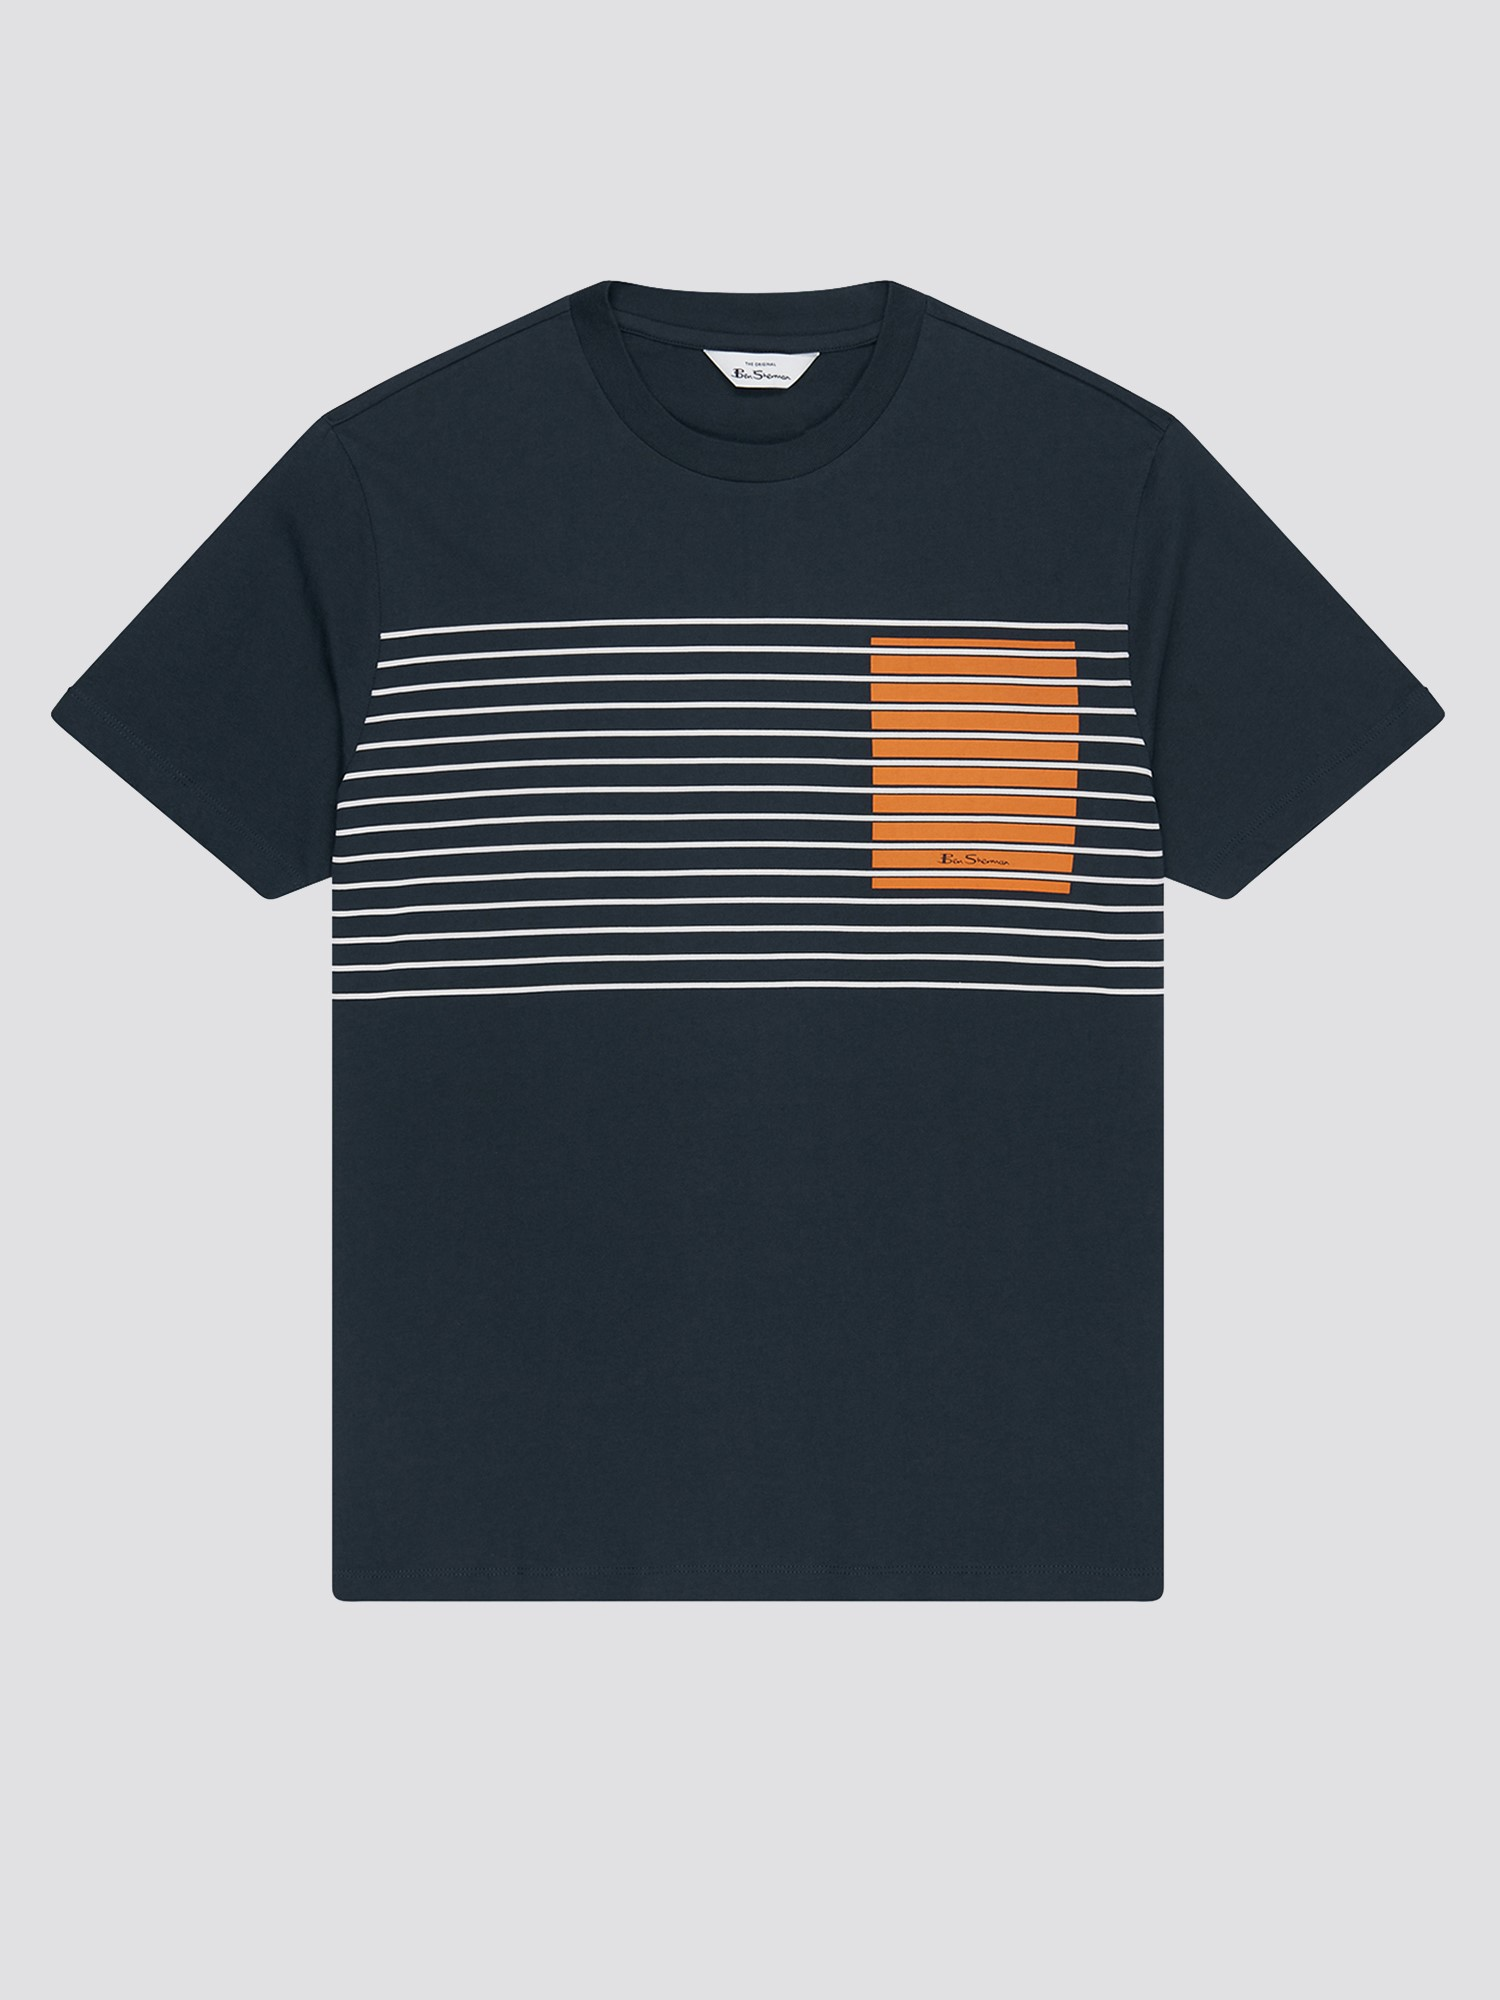 Colour Block Stripe Tee